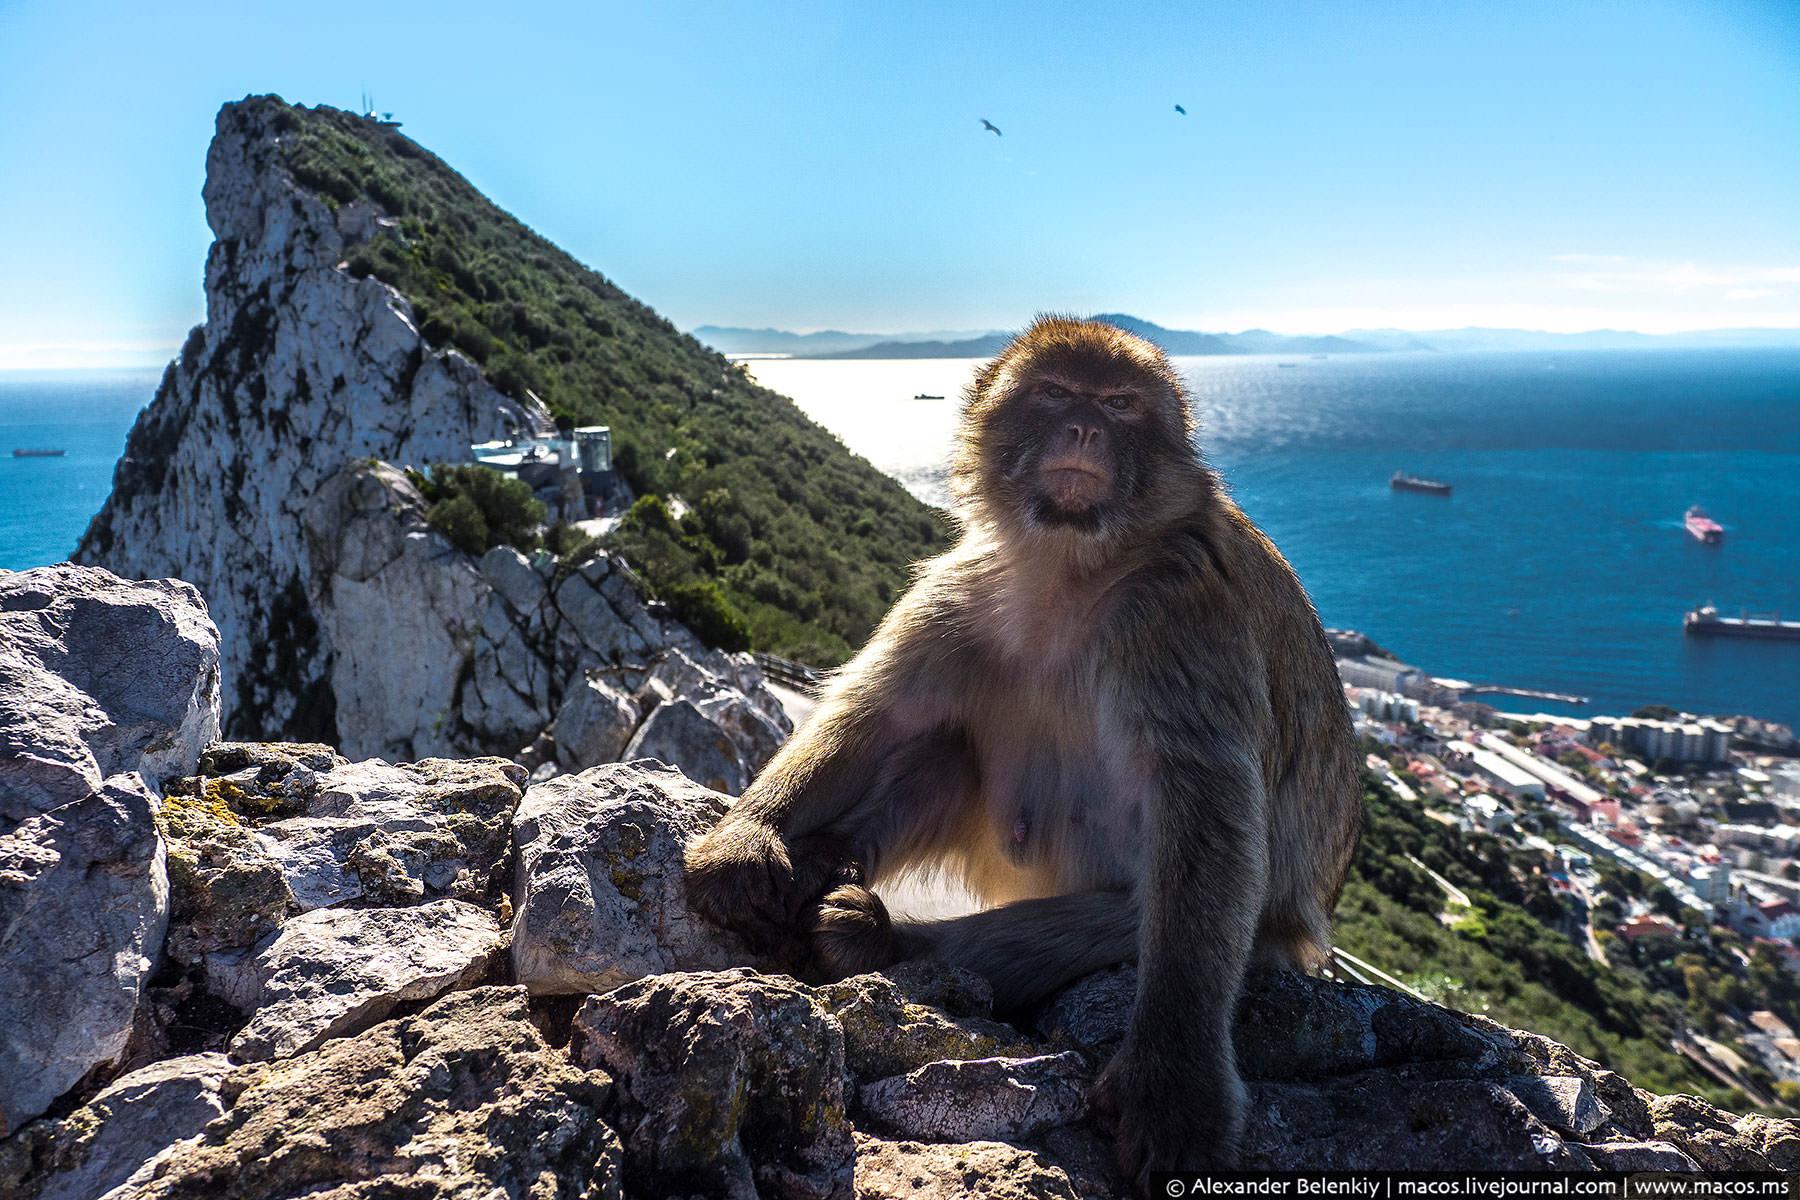 Гибралтар: Британия на дальних берегах